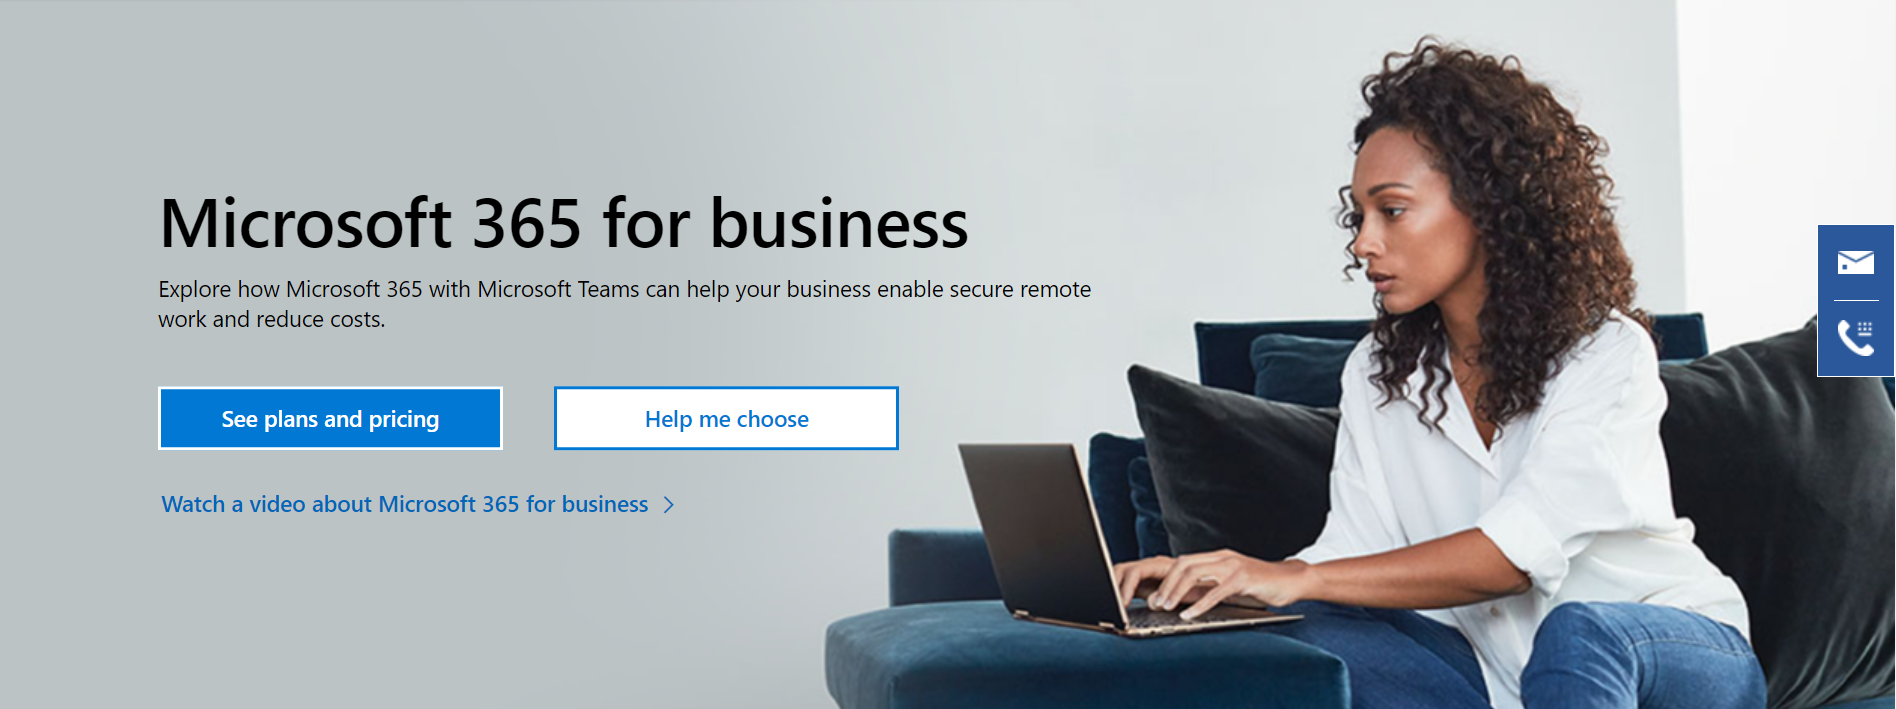 Microsoft 365 suffers a major outage